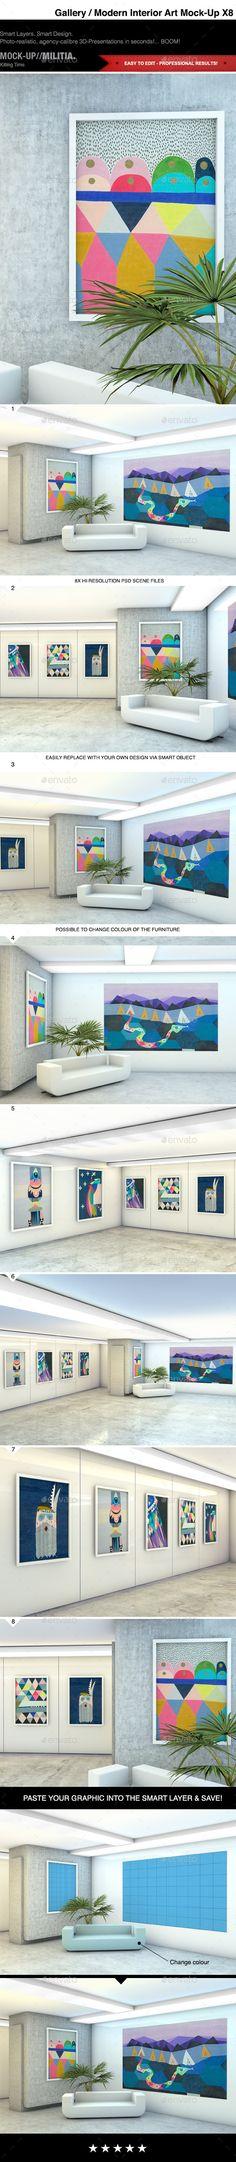 Office | Studio Art Gallery | Photography Mock-Up #officemockup #gallerymockup Download: http://graphicriver.net/item/office-studio-art-gallery-photography-mockup/10507471?ref=ksioks